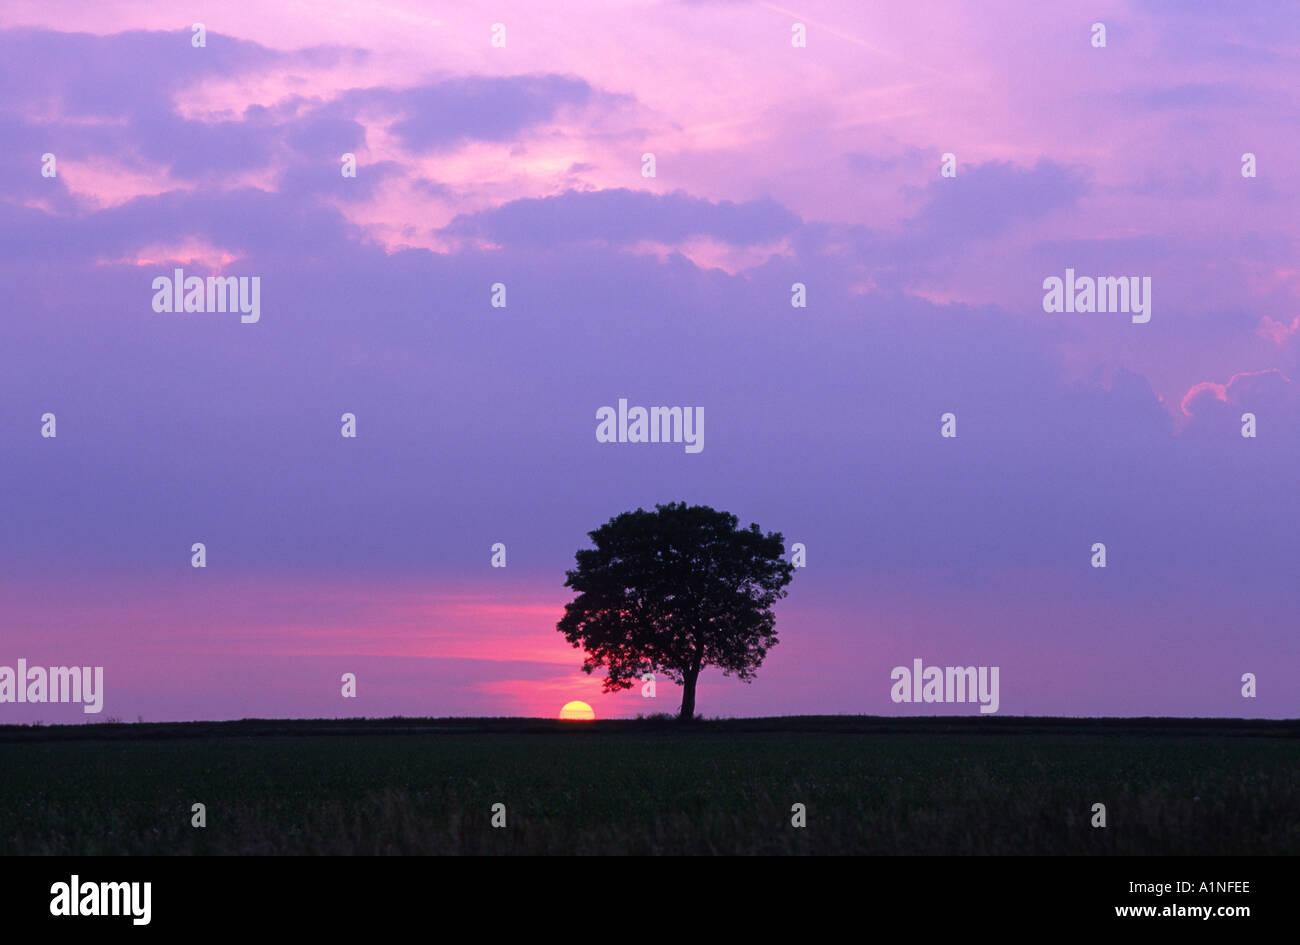 Single Tree At Sunset Taken In France - Stock Image